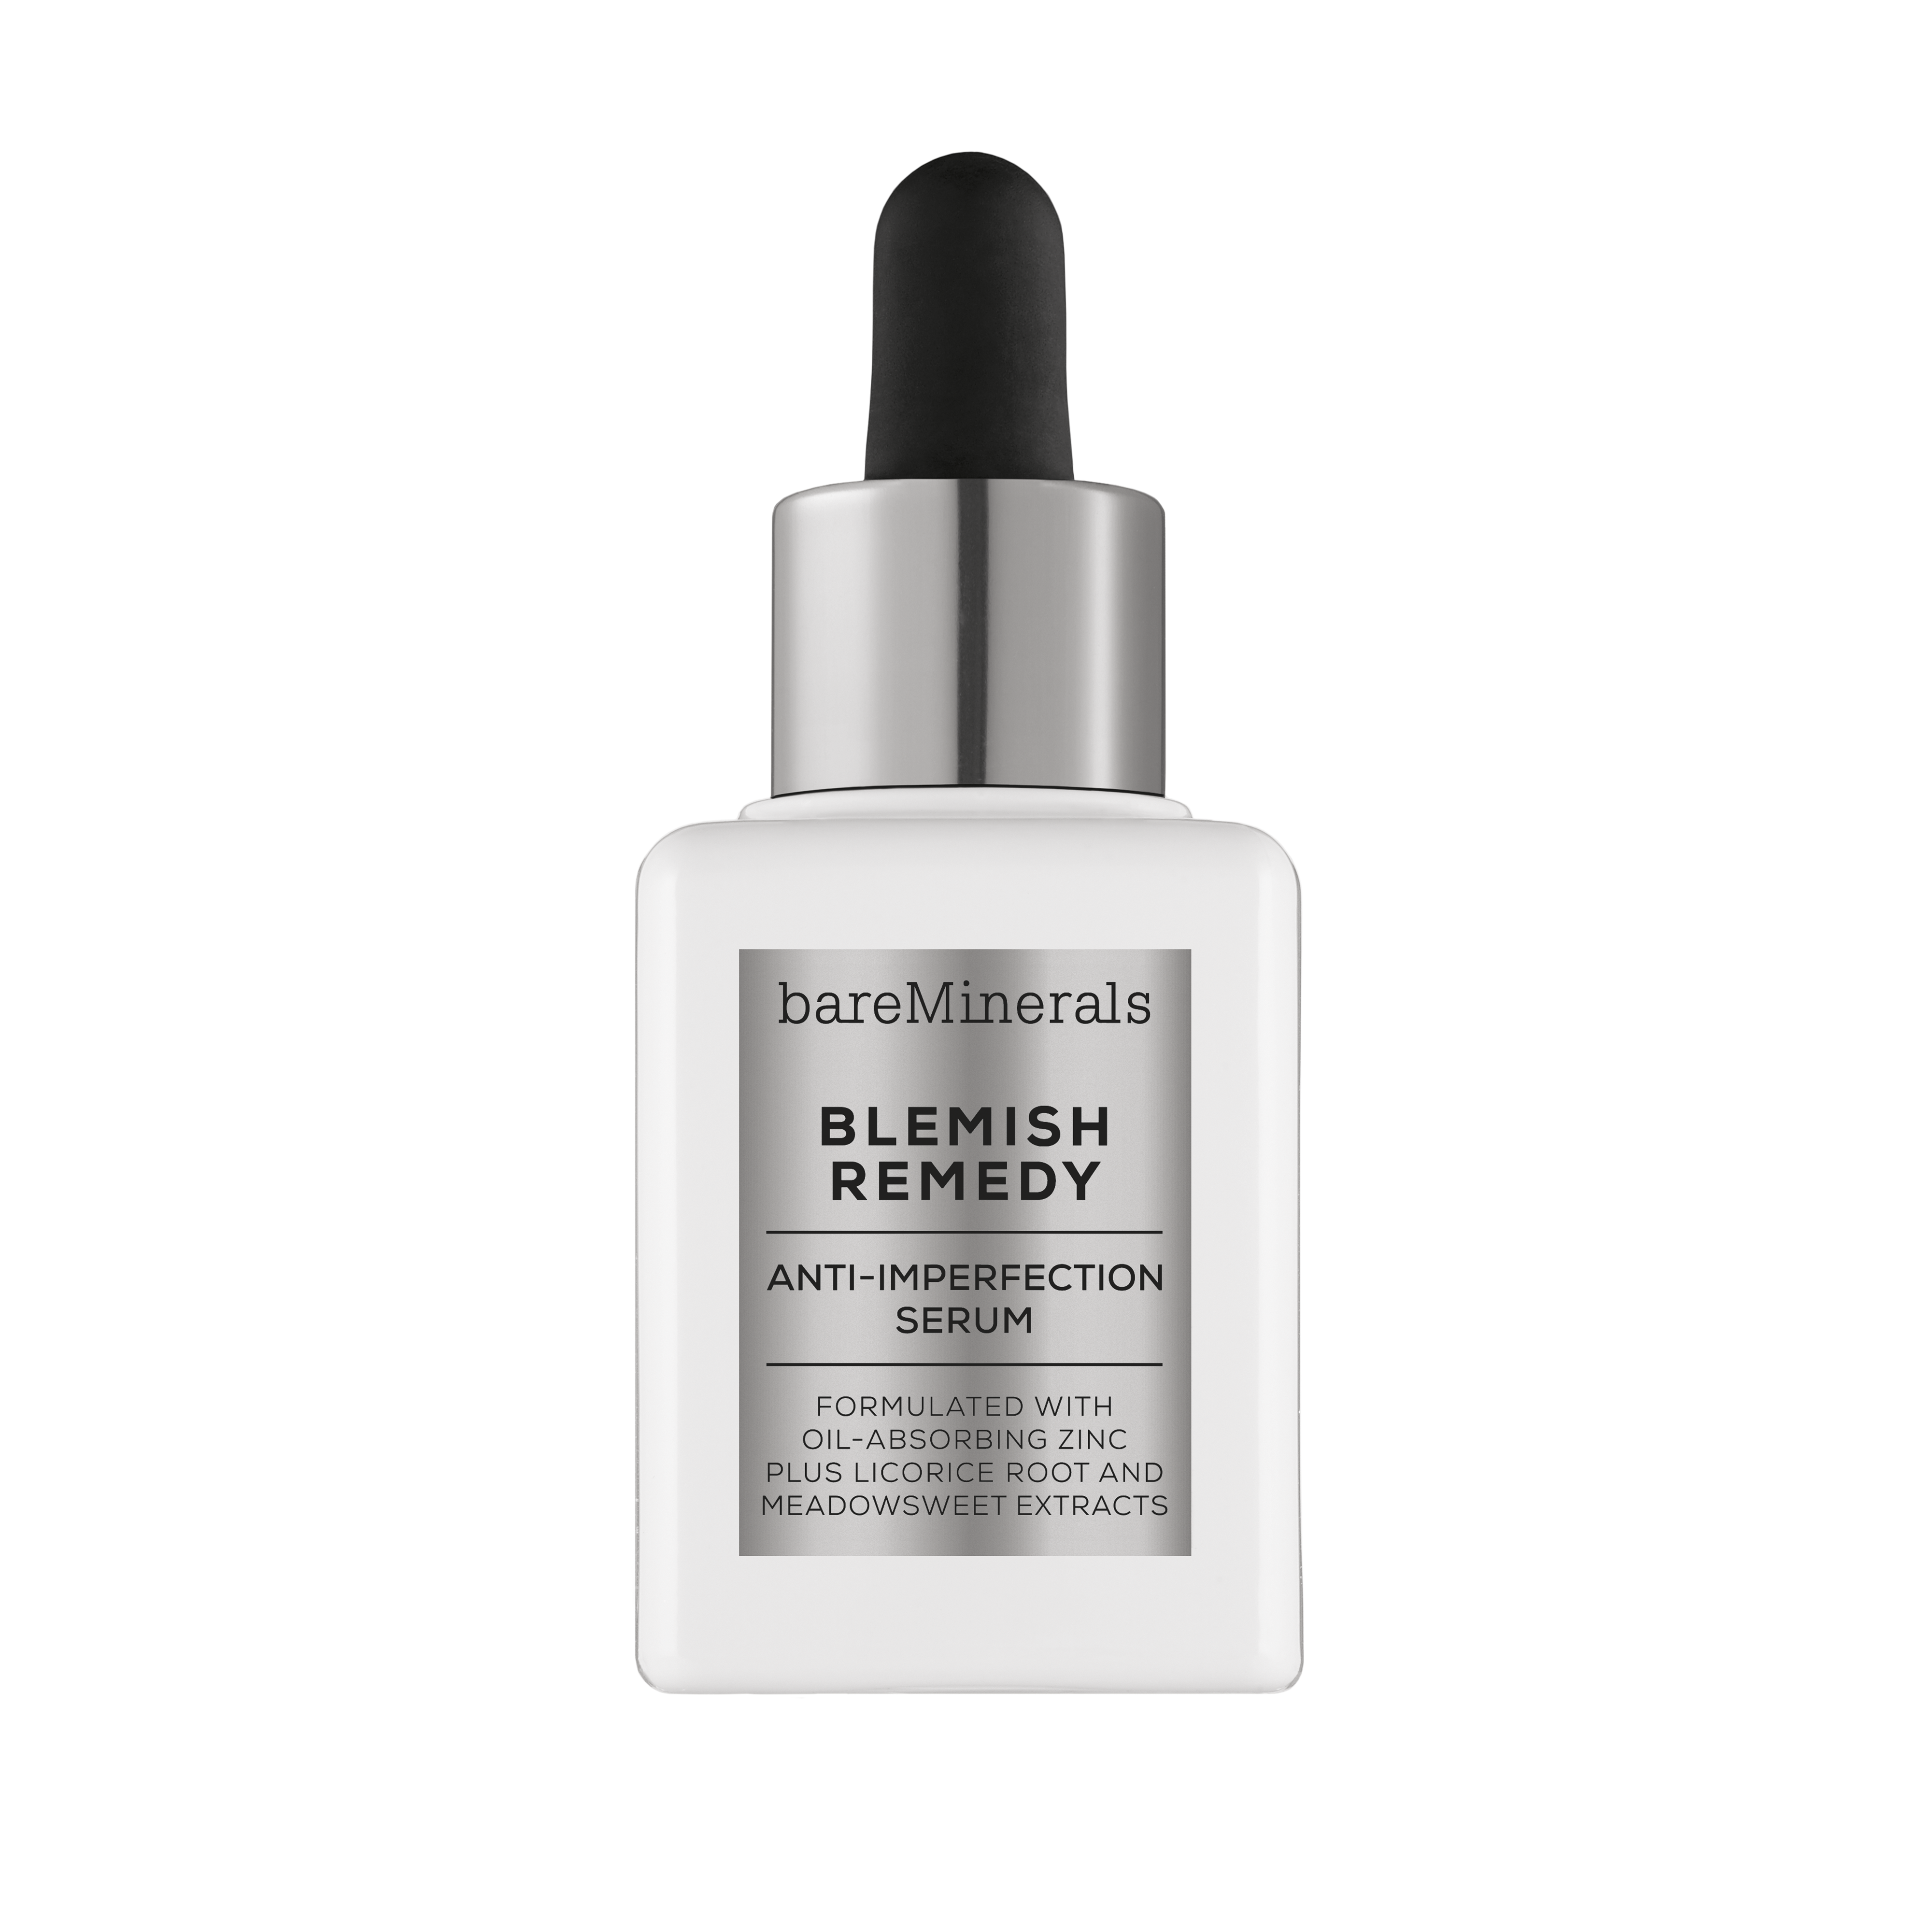 Blemish Remedy™ Anti-Imperfection Serum